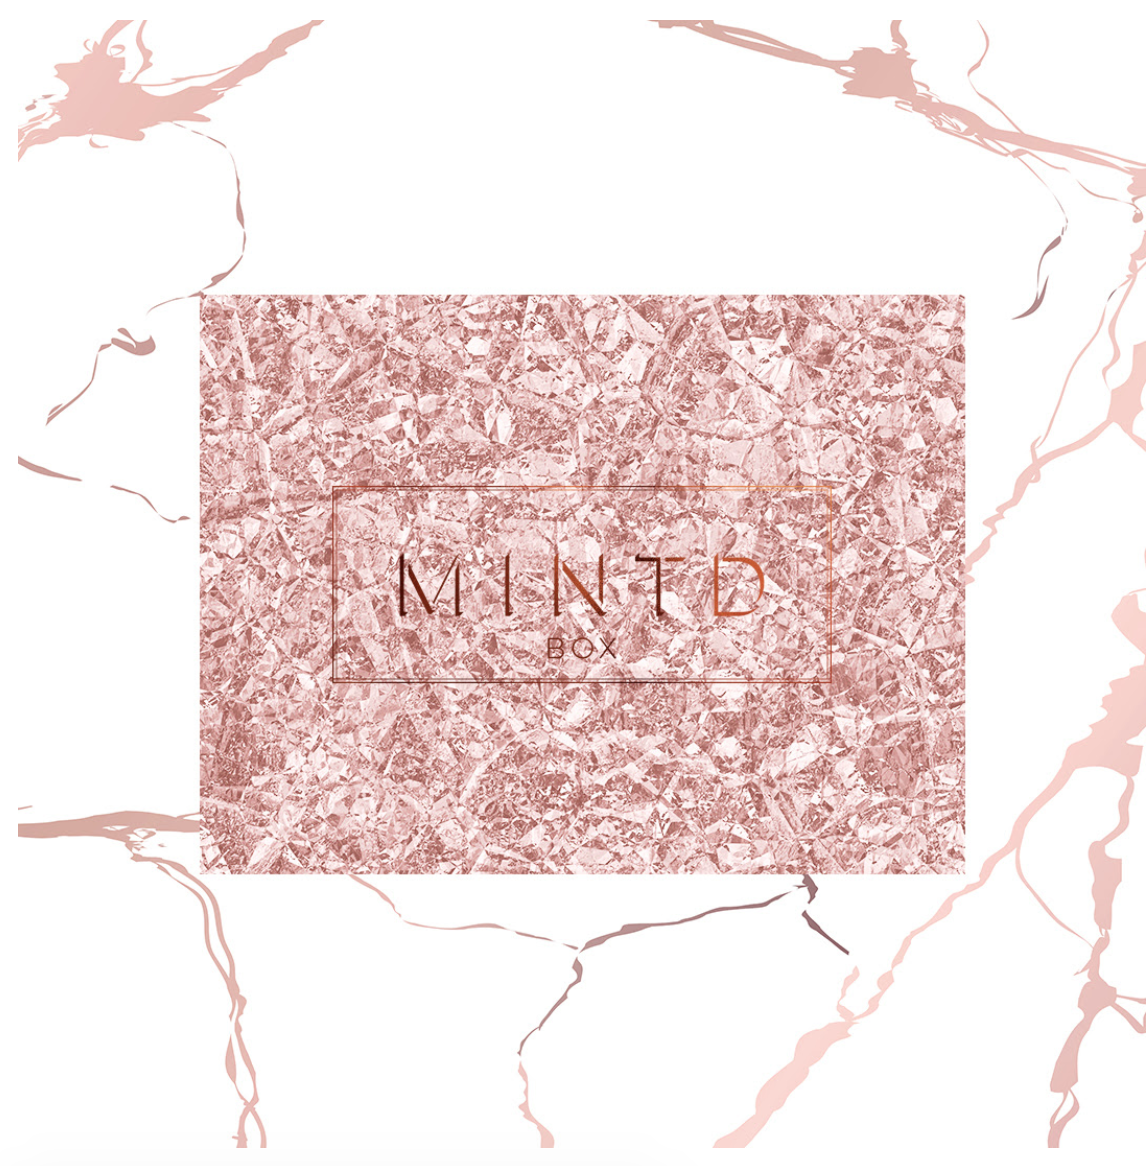 MINTD Box July 2019 FULL Spoilers + Coupon Code!